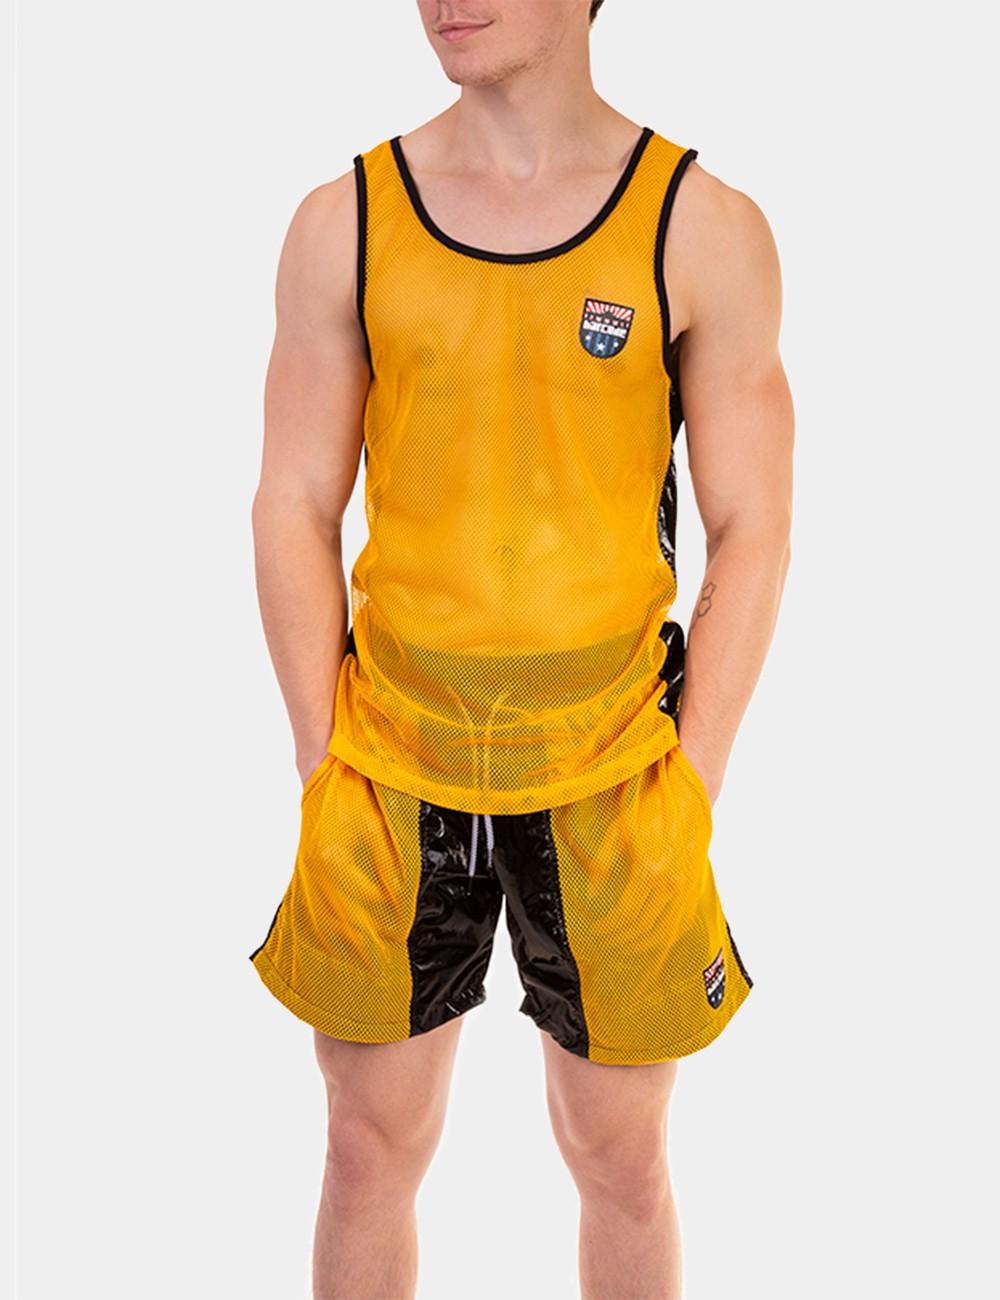 Tank Top Carlos - Yellow-Black